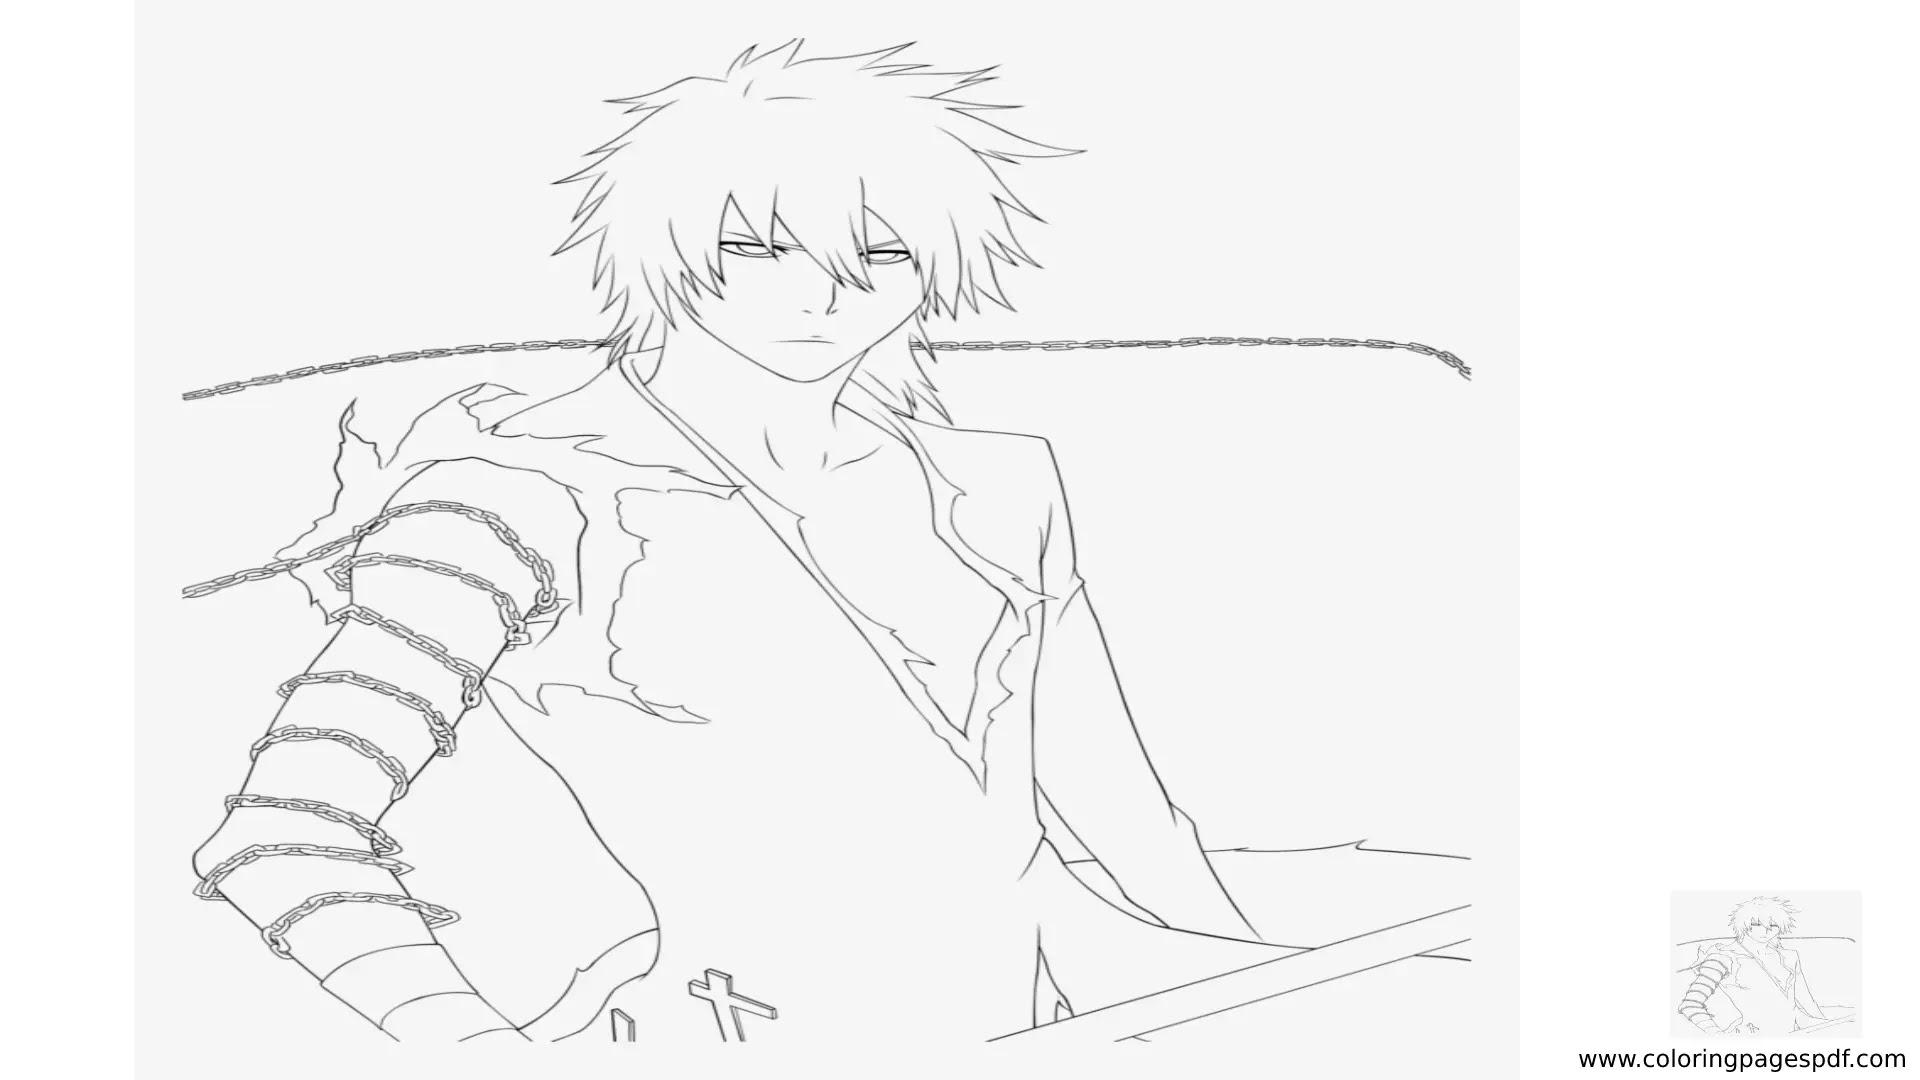 Coloring Page Of Ichigo (Bleach)